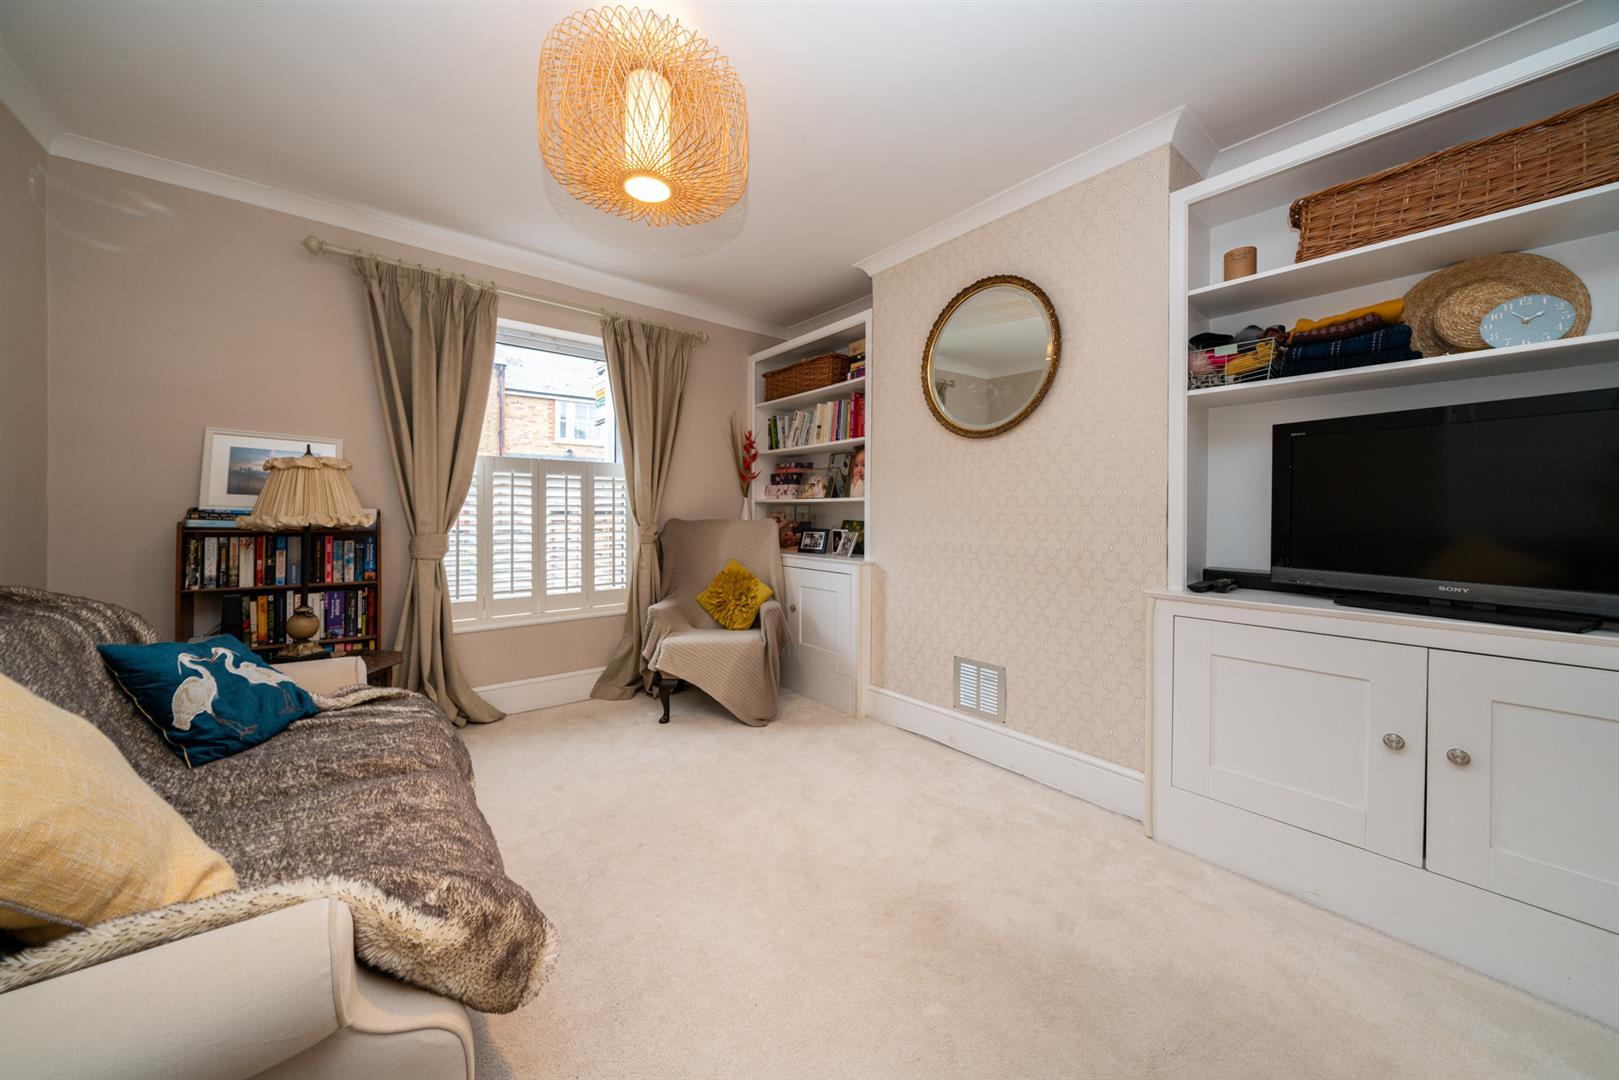 5-Cross-Oak-Road-4620 - living room.jpg